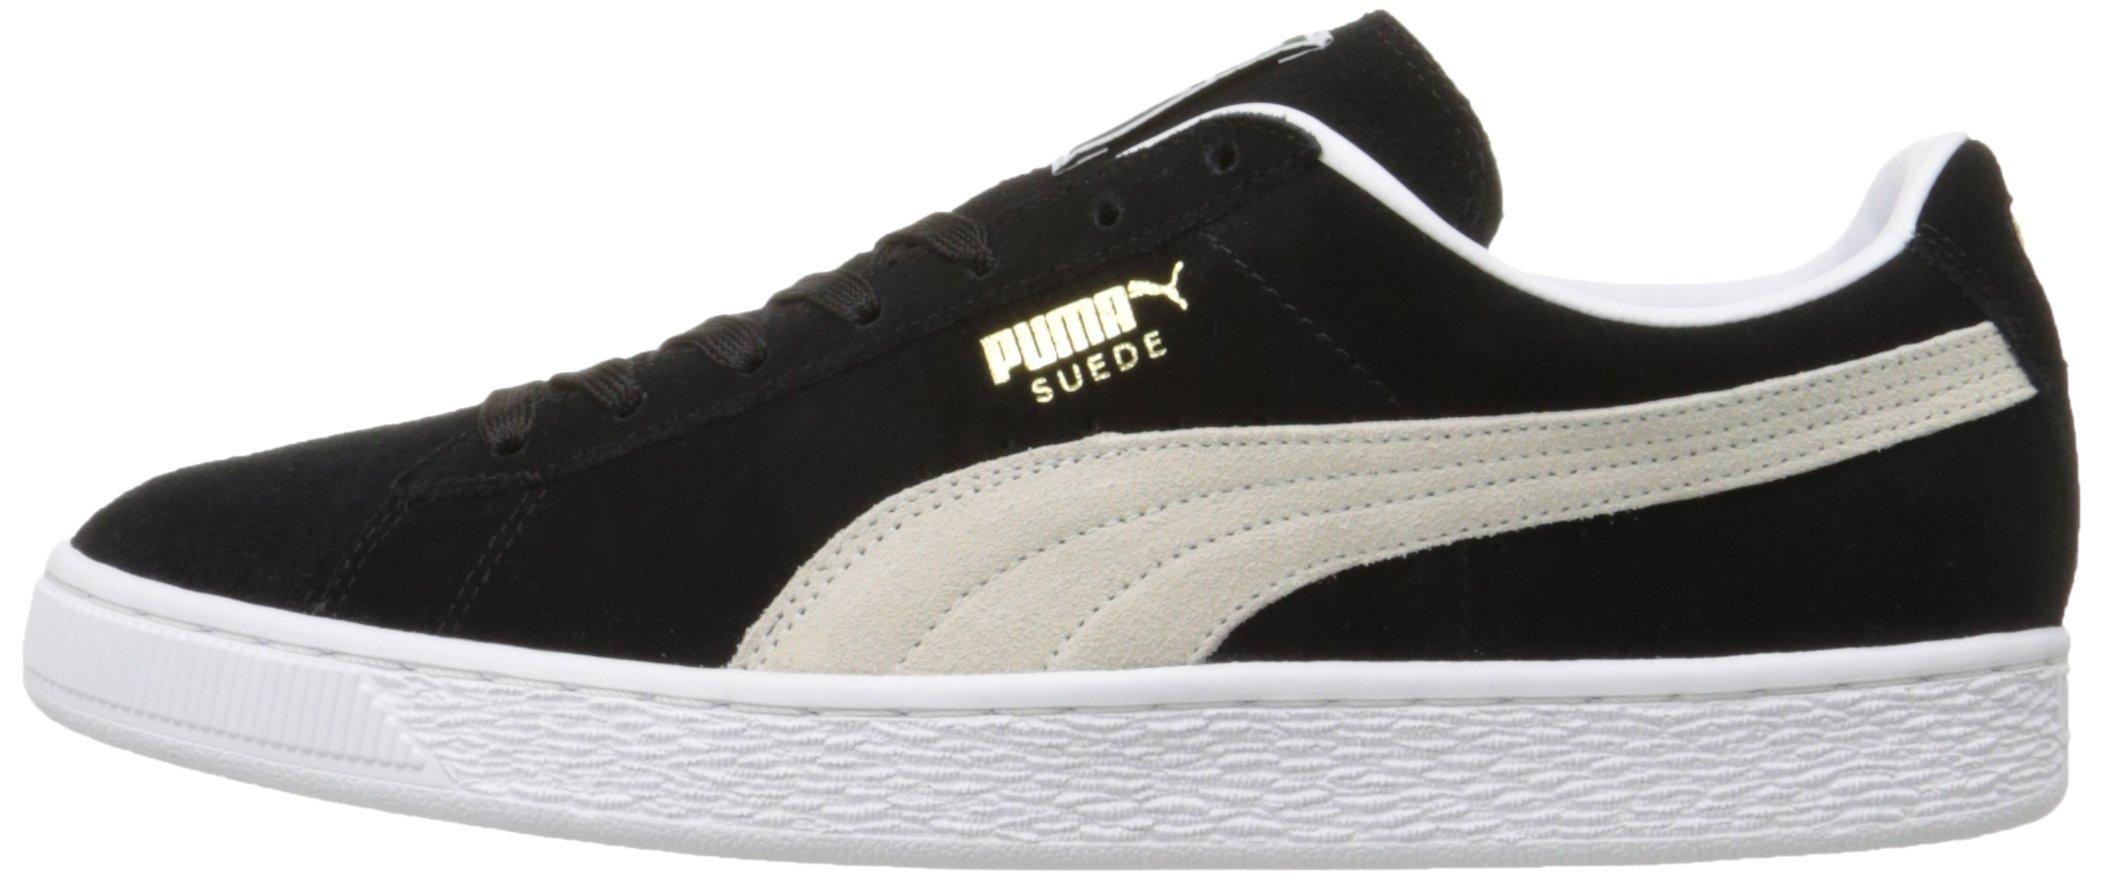 PUMA Suede Classic Sneaker,Black/White,9.5 M US Men's by PUMA (Image #13)